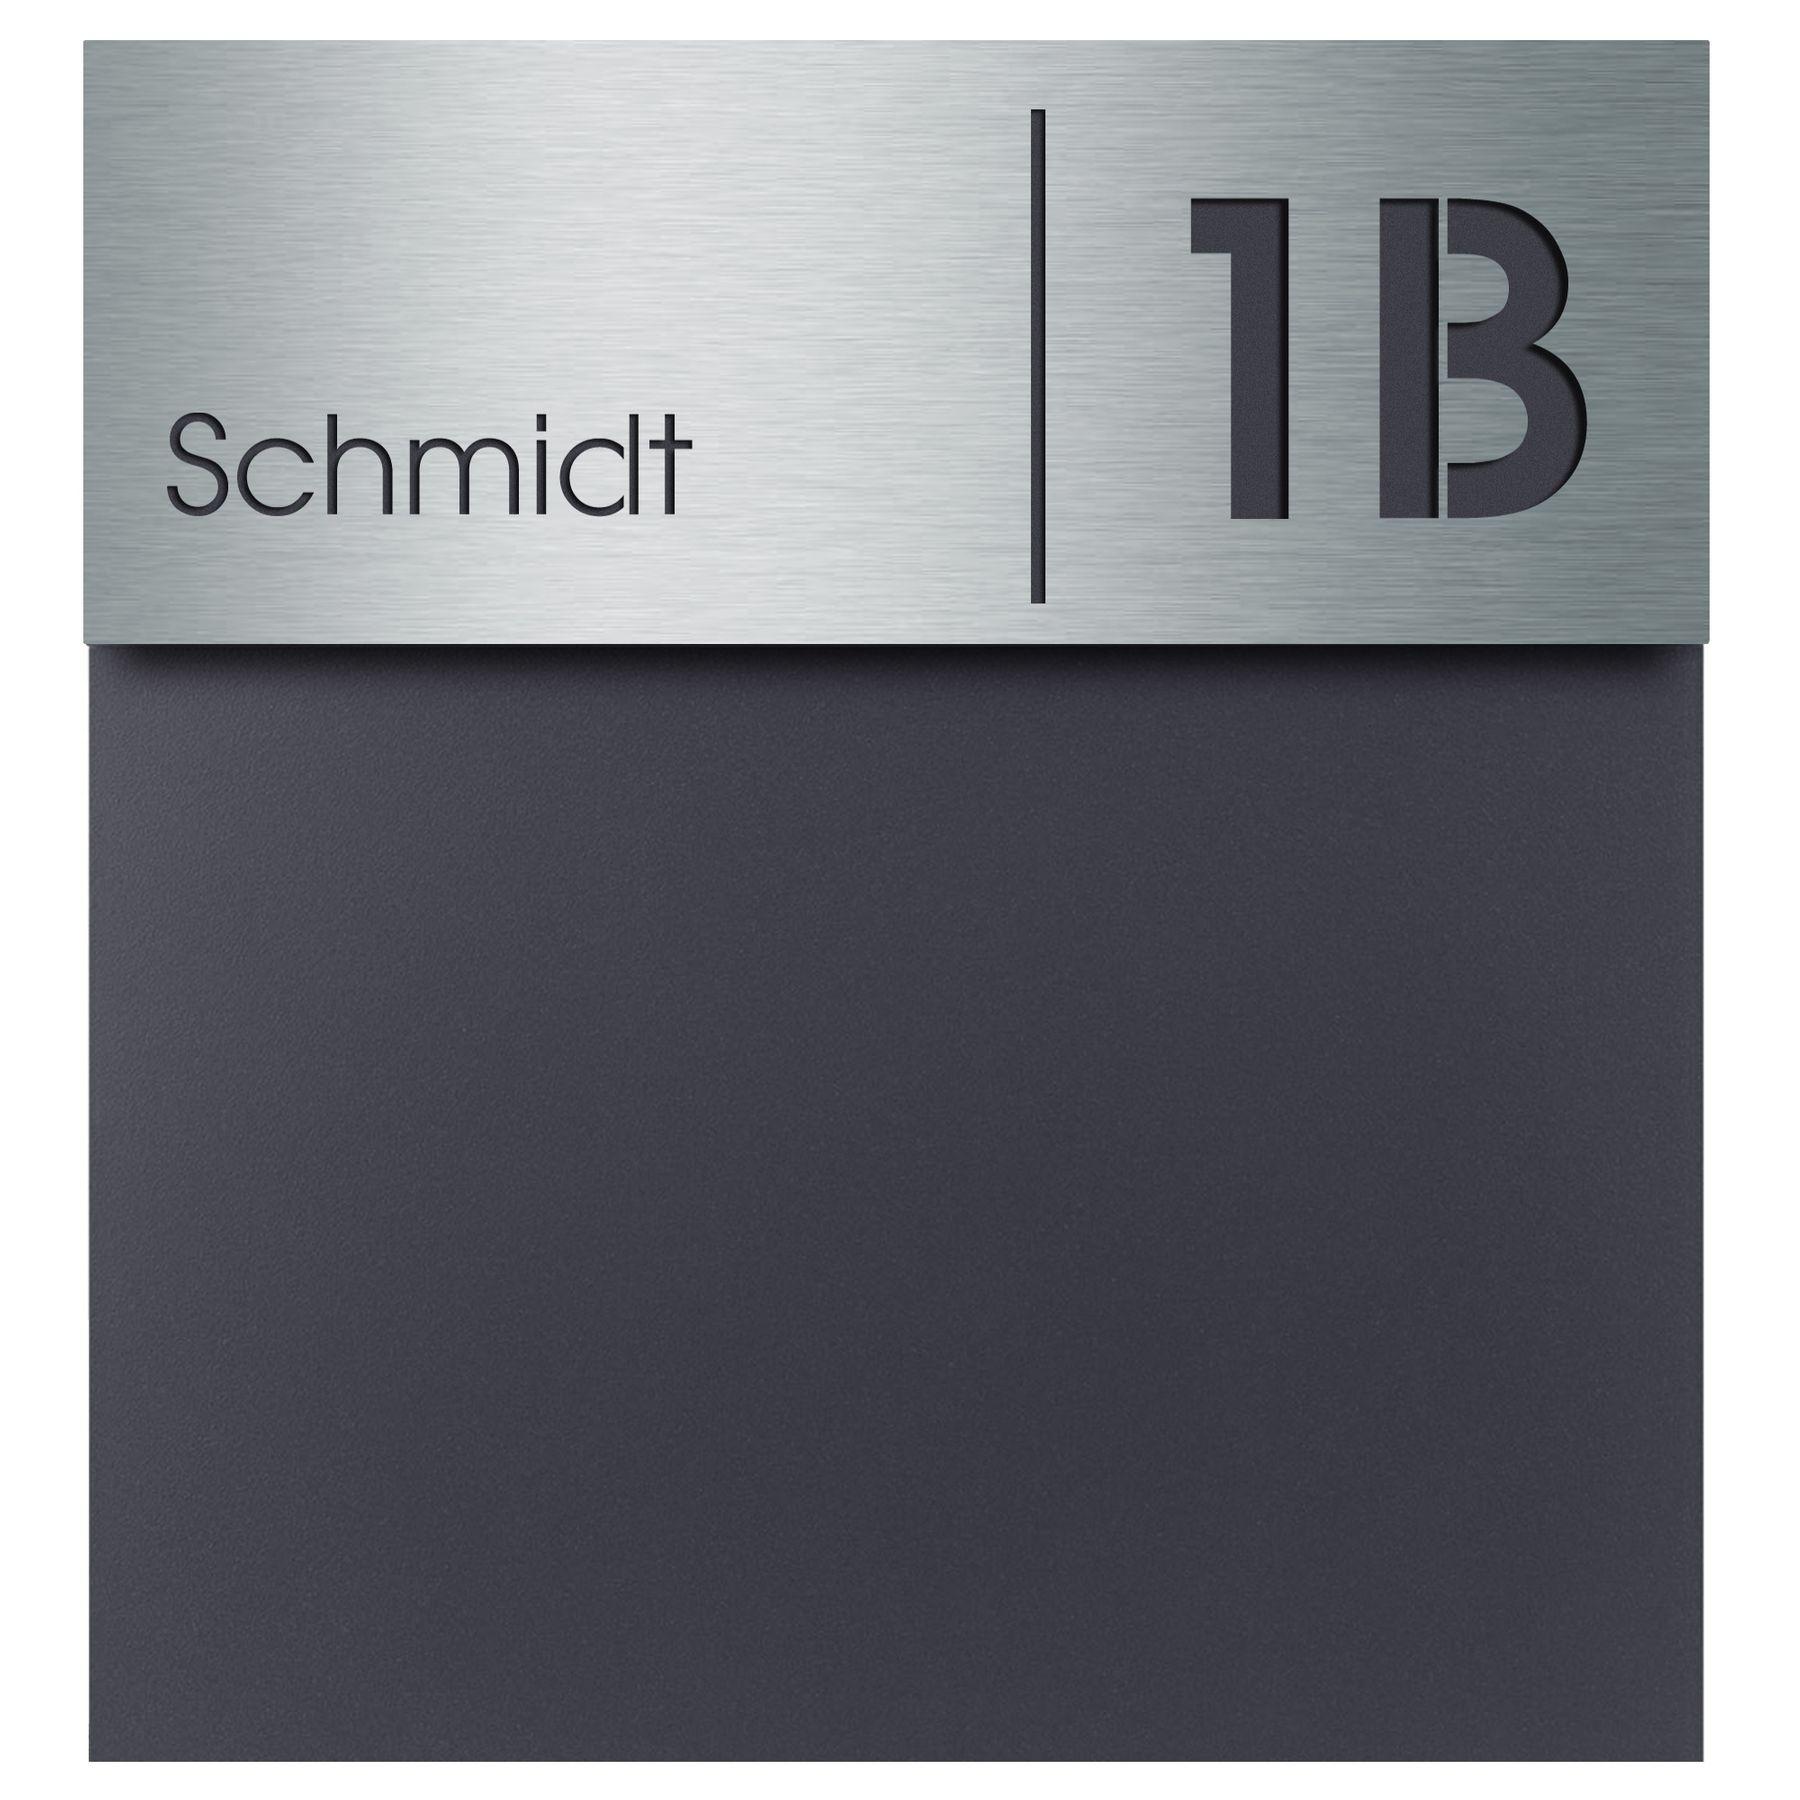 RAL 7016 Edelstahl Hausnummer-//Namensschild Gravur anthrazit-grau modern gro/ß MOCAVI Box 570 Design-Briefkasten inkl